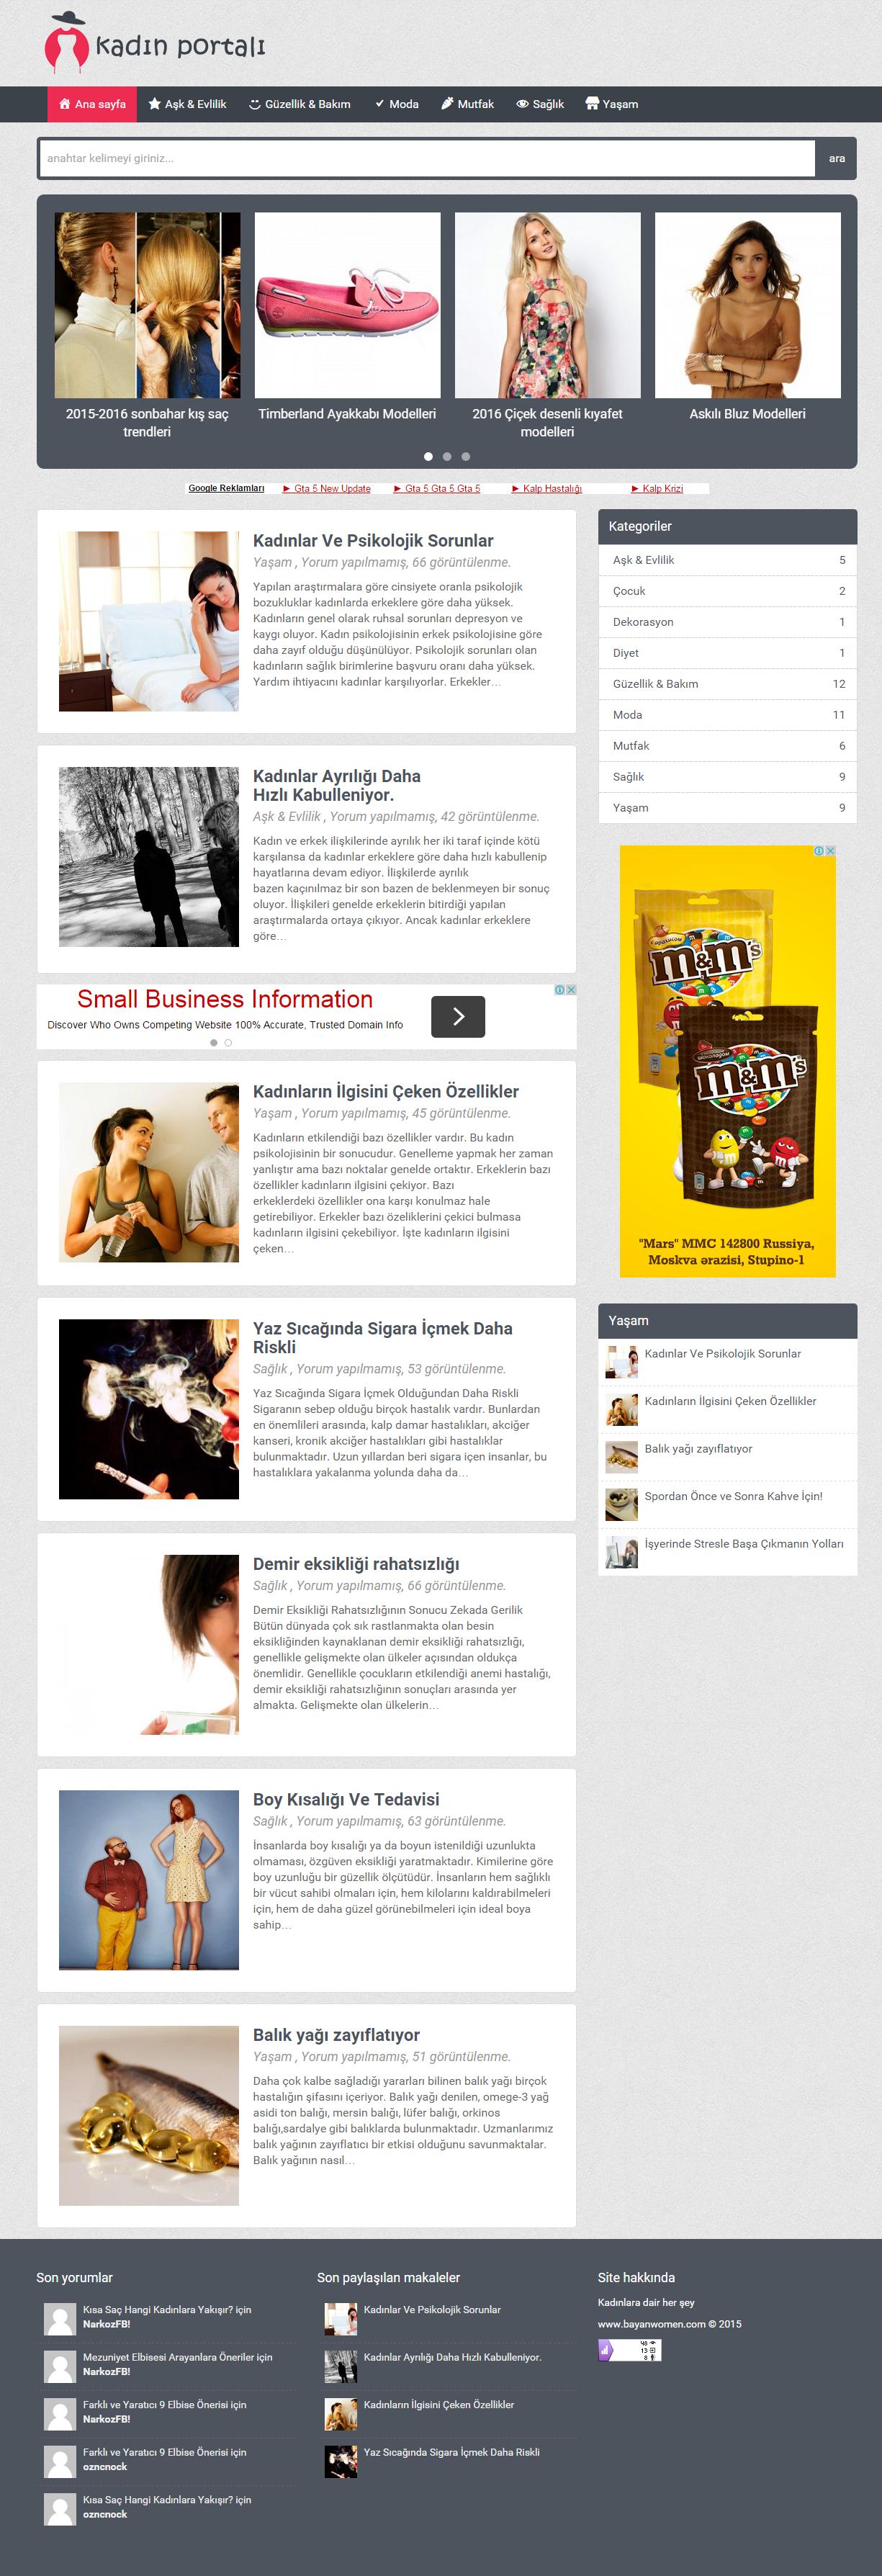 SMDV1 wordpress theme homepage